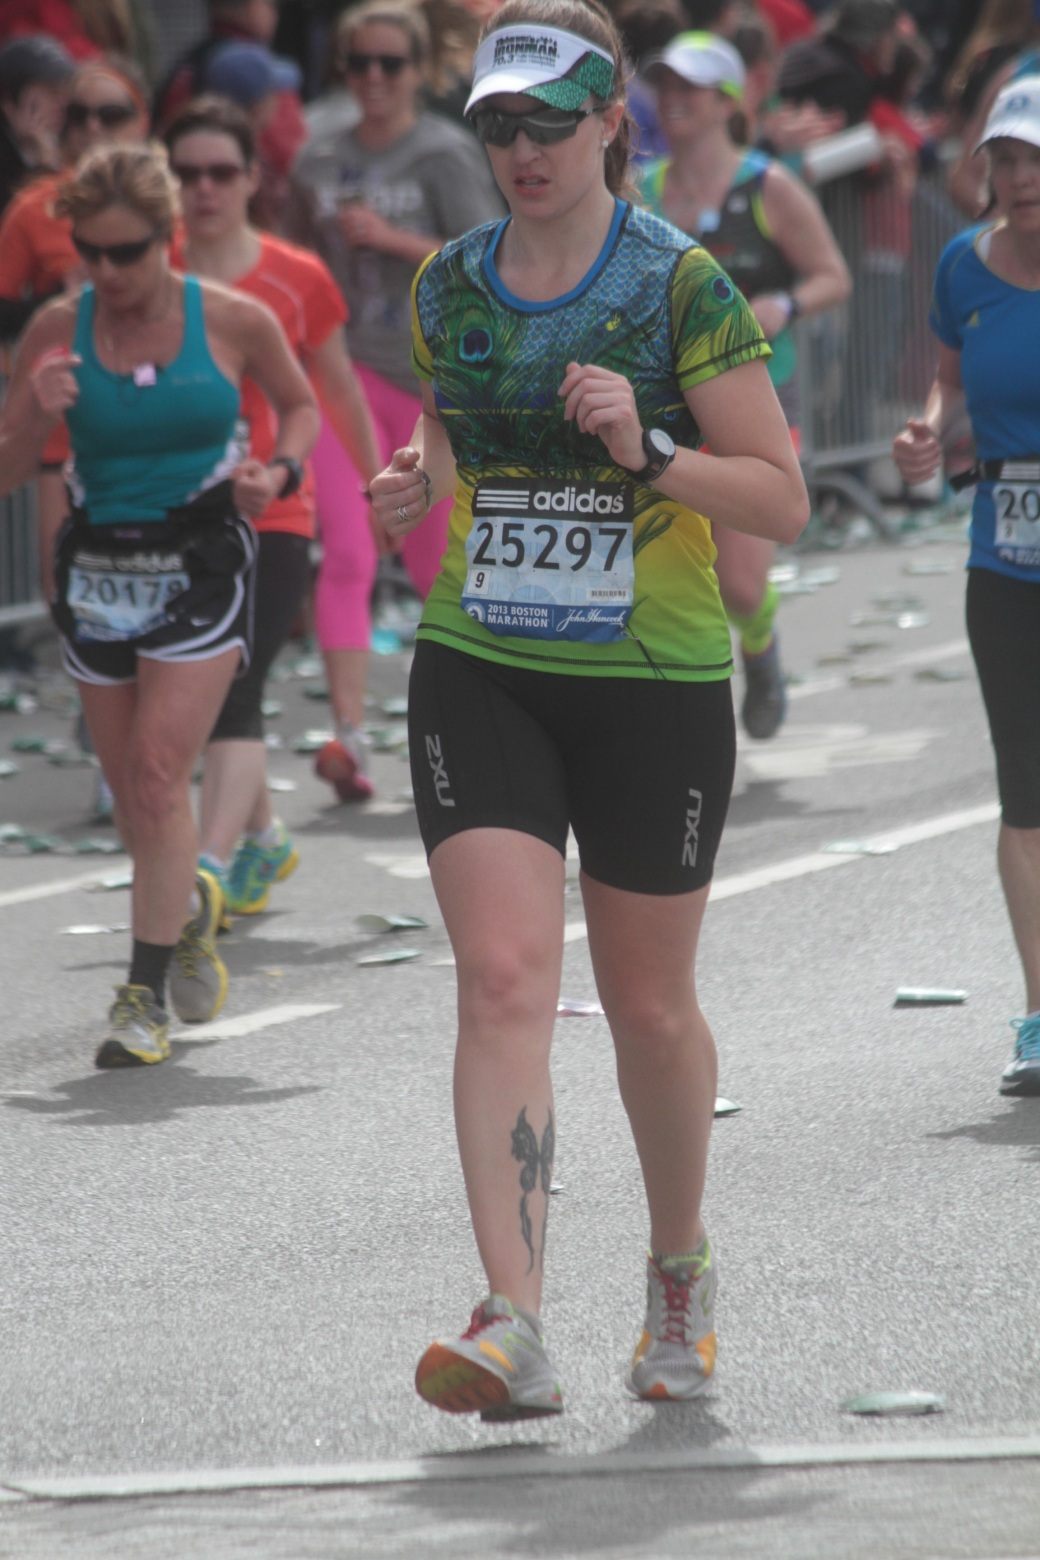 boston marathon 2013 number 25297